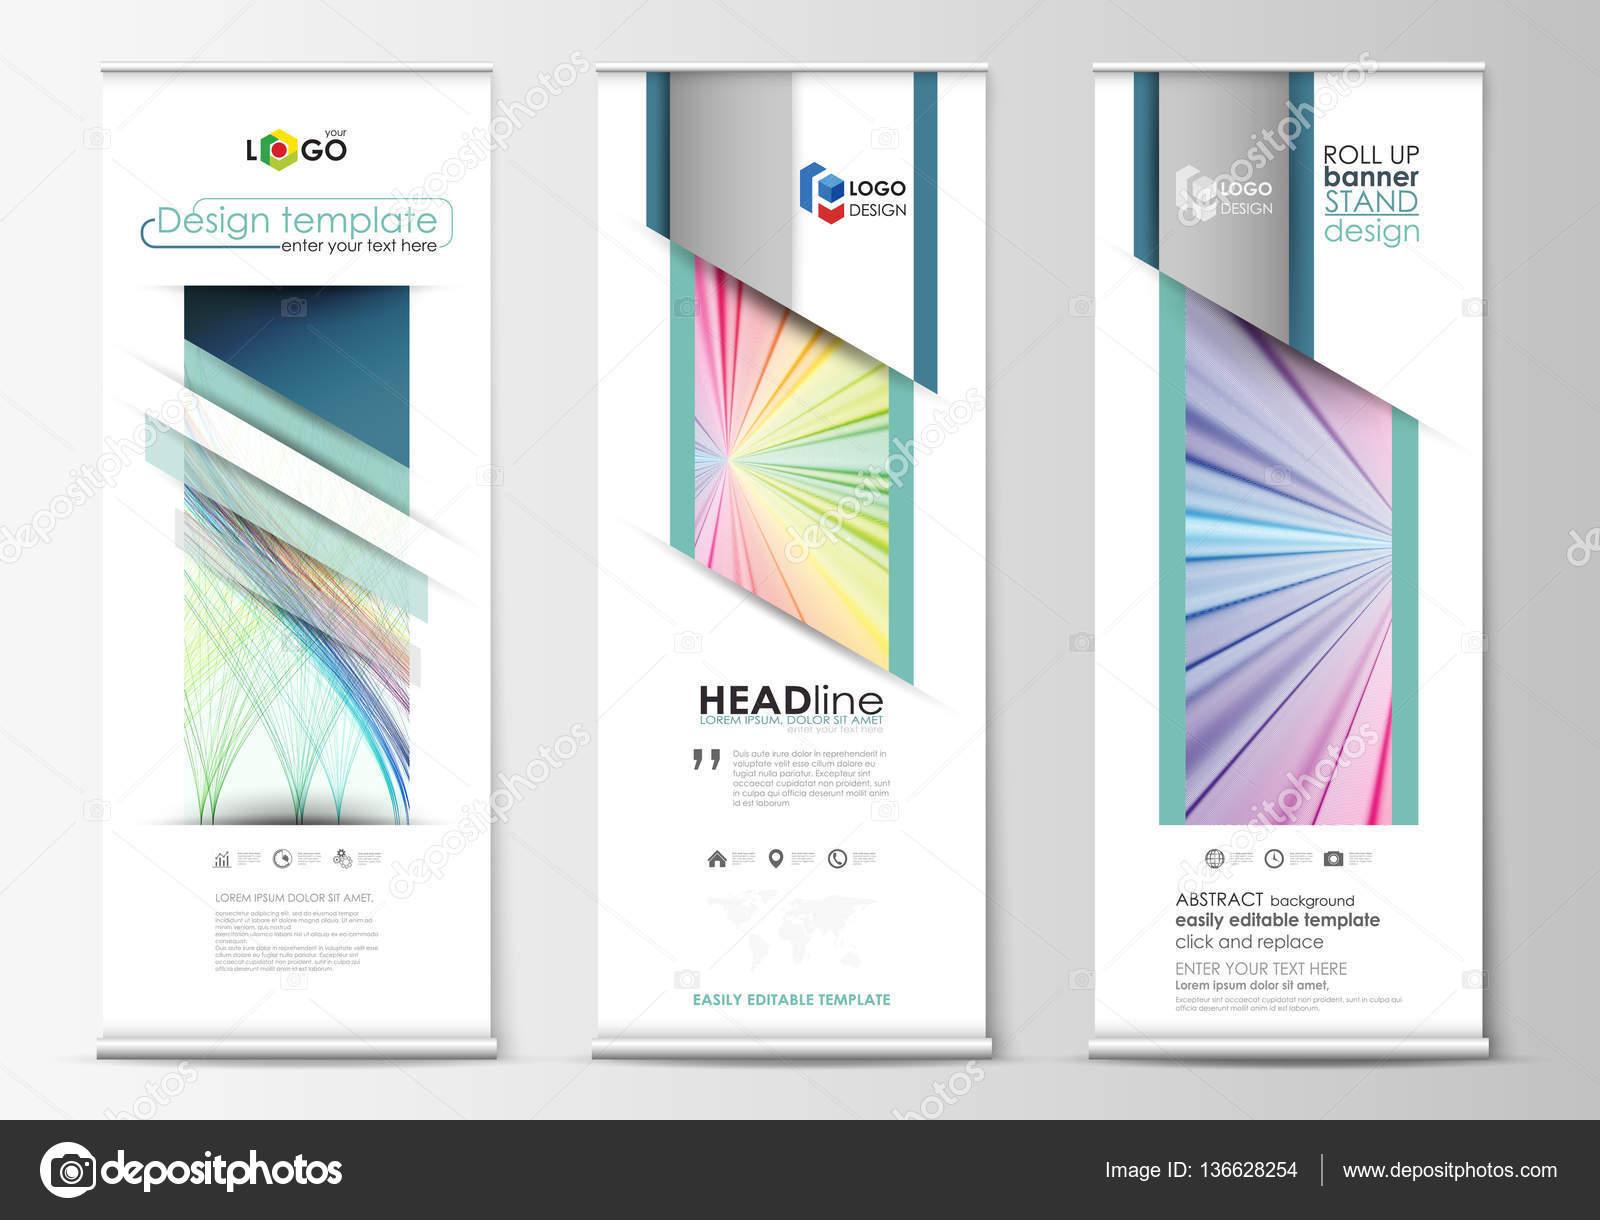 Roll up banner stands, plantillas de estilo geométrico, concepto de ...